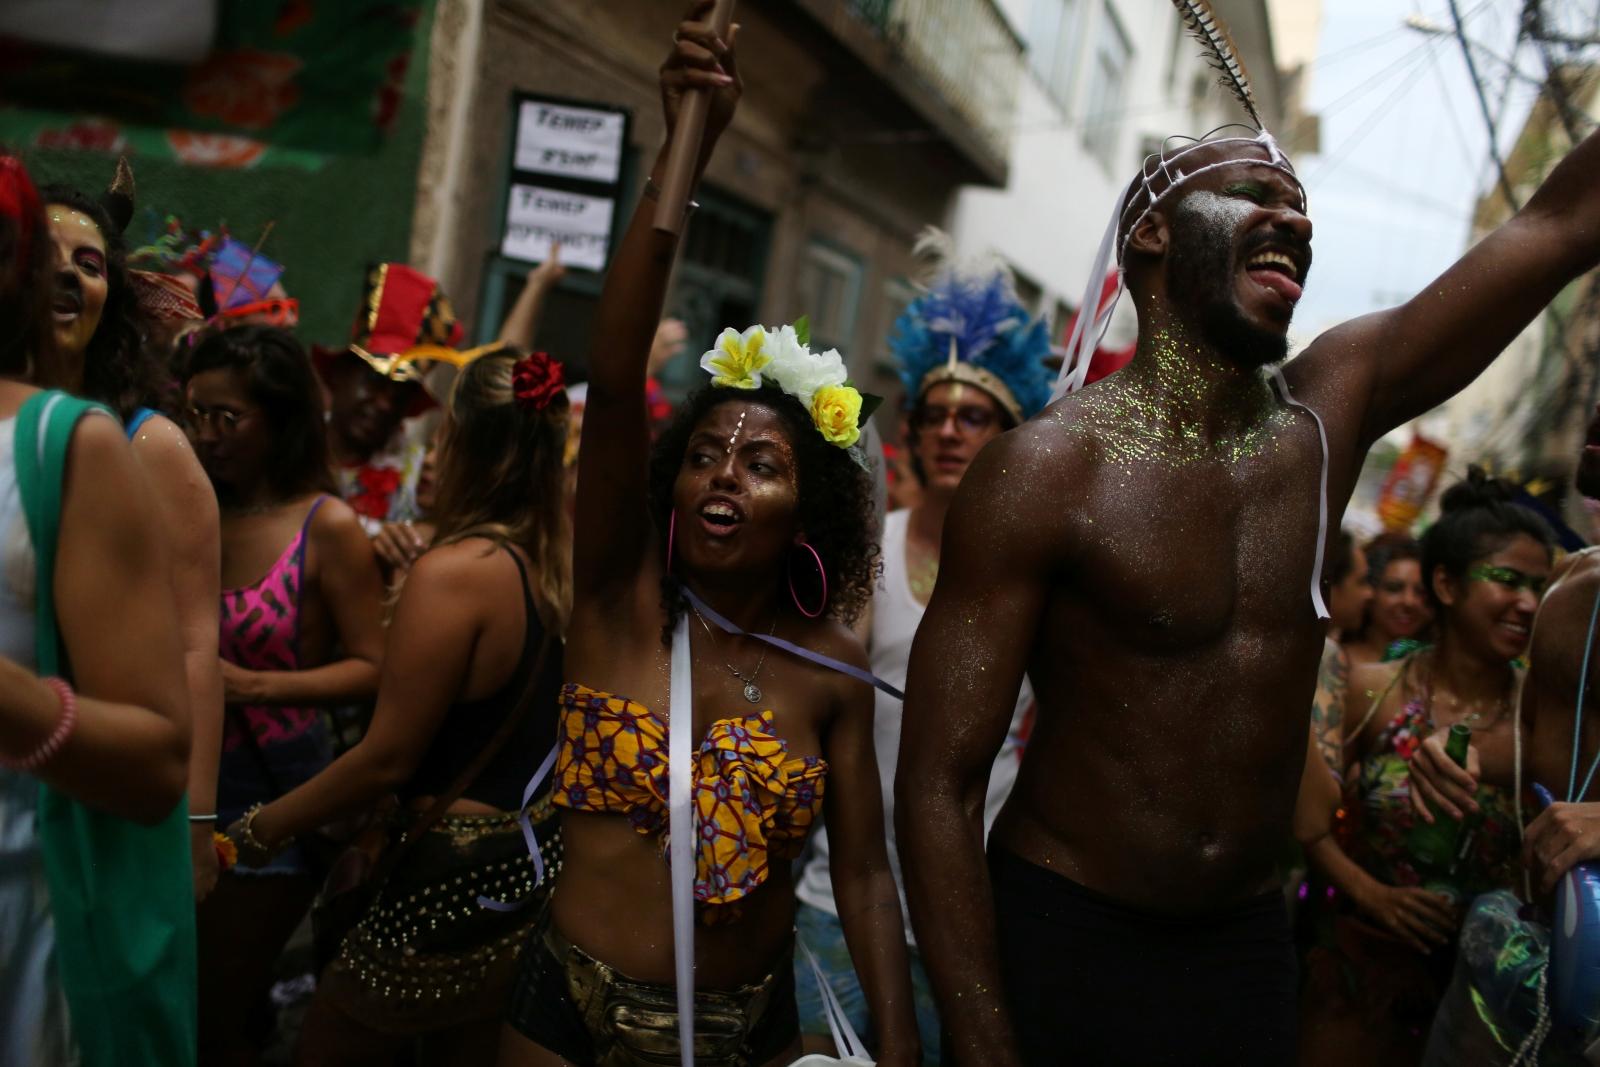 Carnival festivities in Rio Janeiro, Brazil